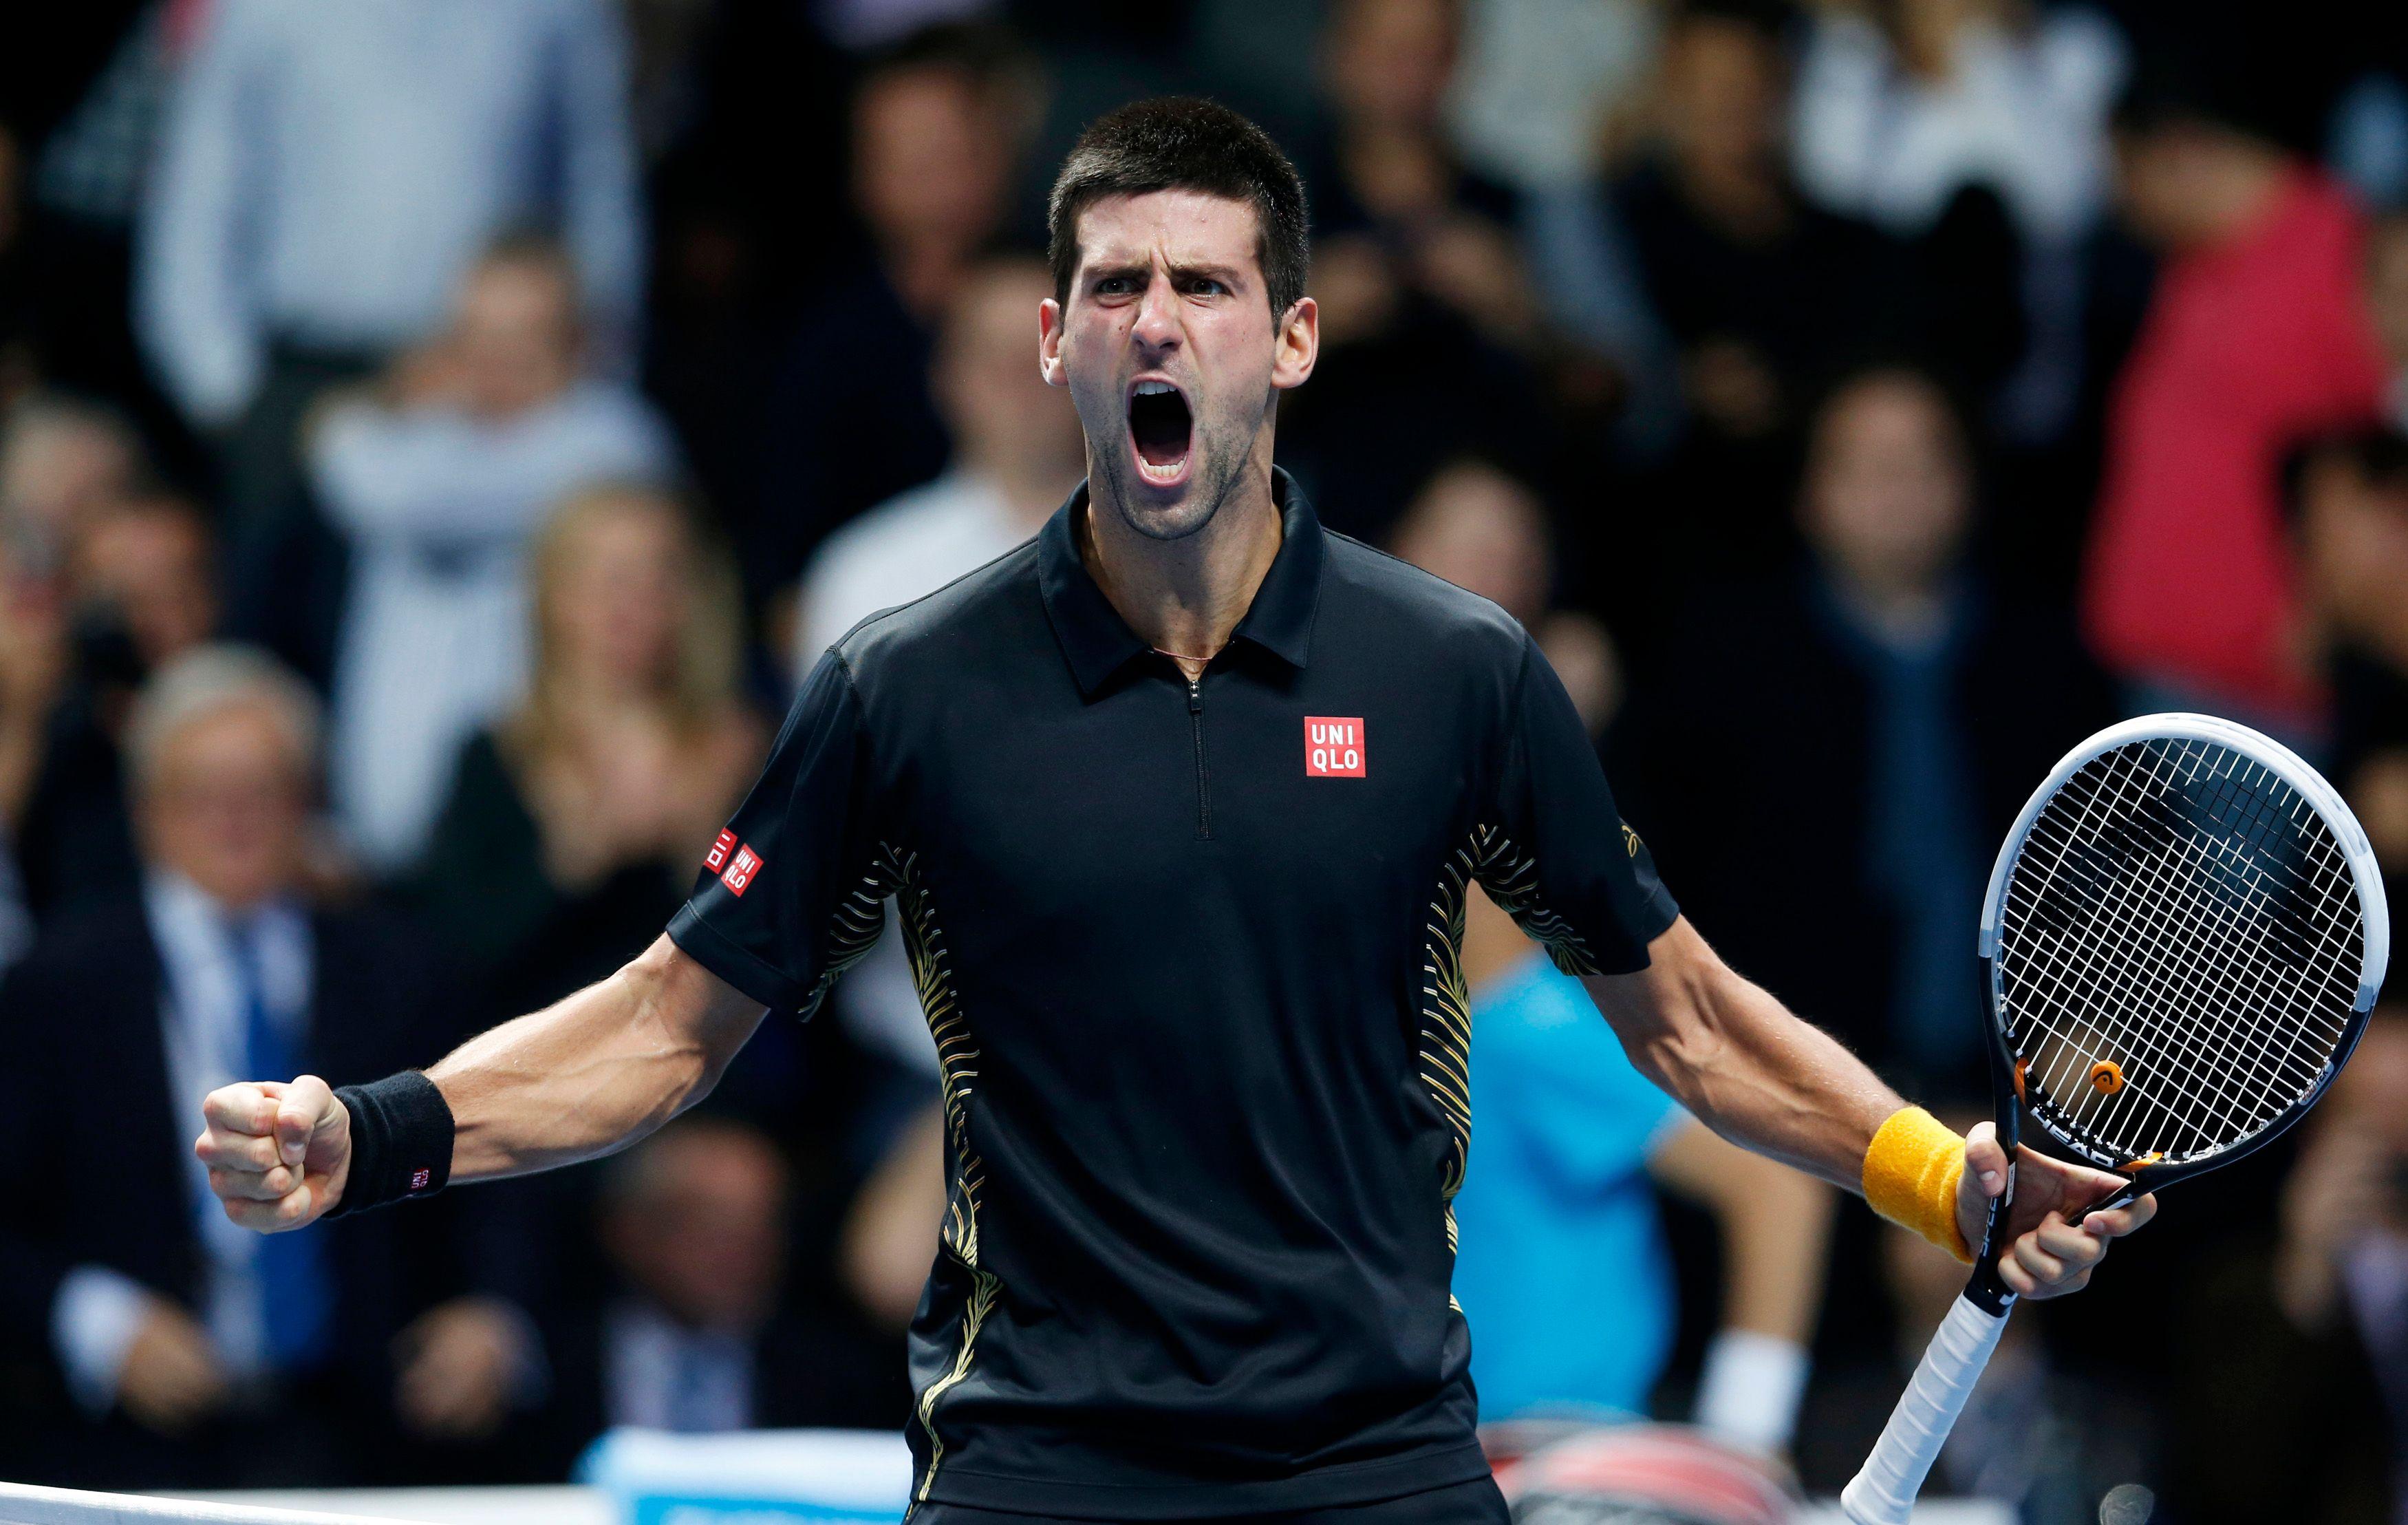 Le joueur de tennis Djokovic.